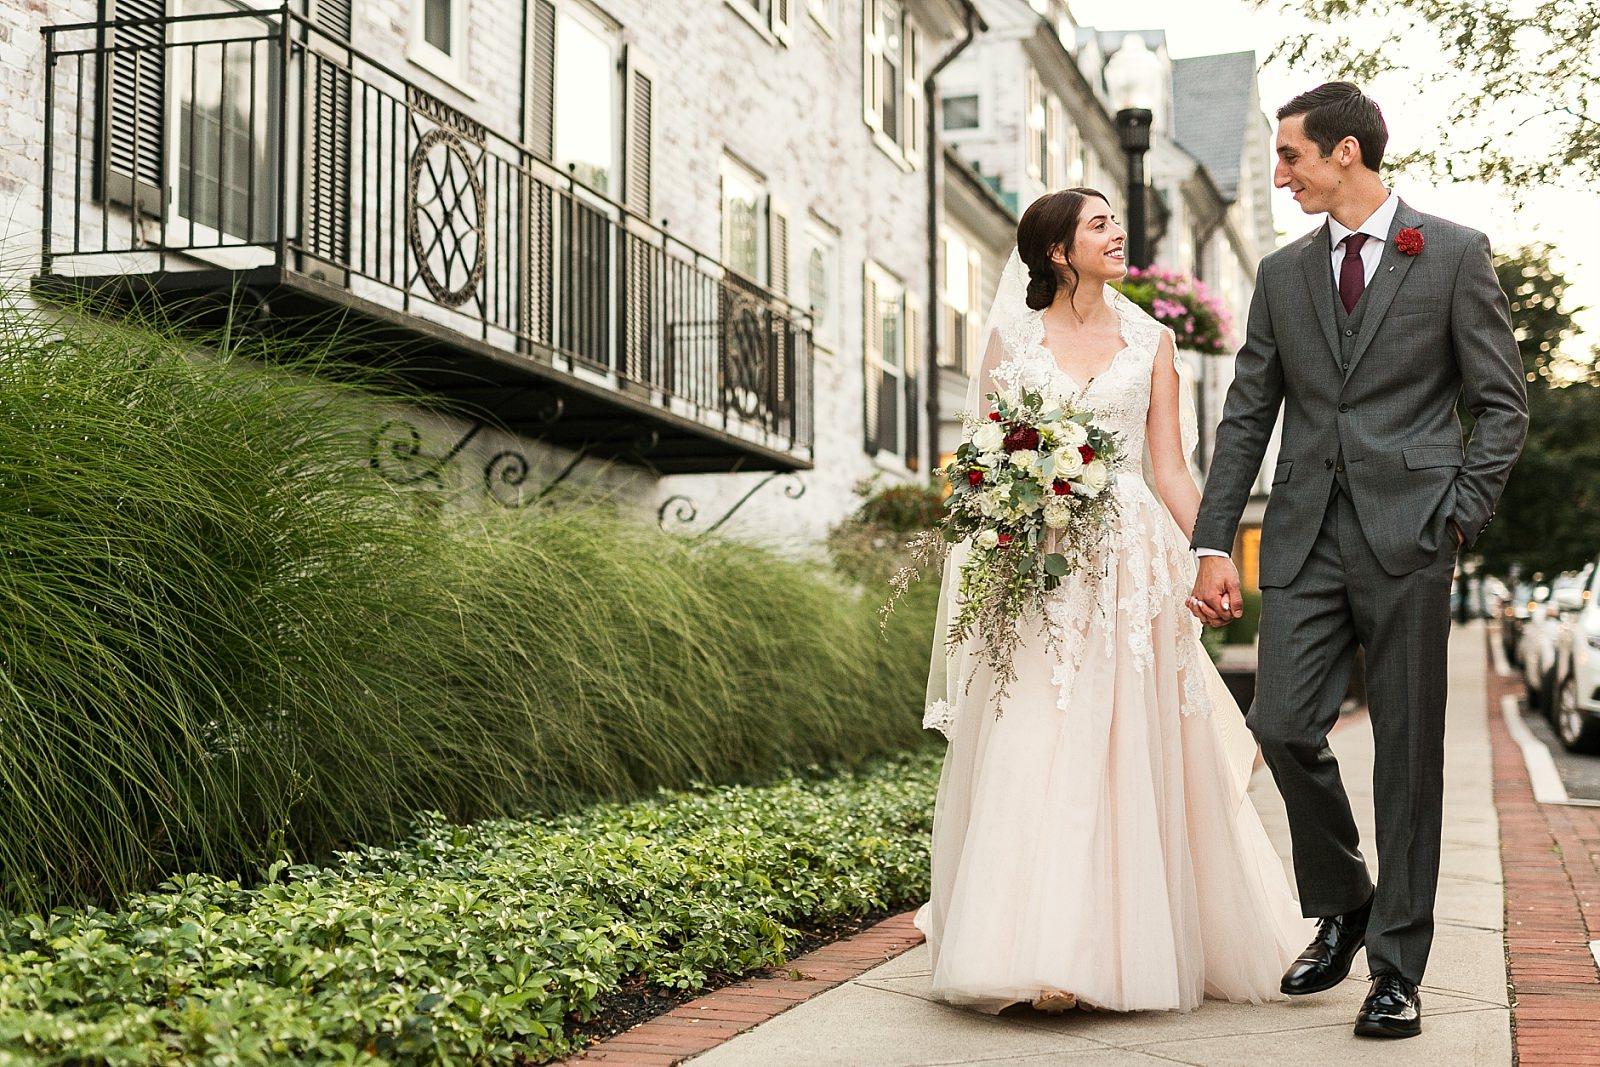 MA_Wedding_Photographer_TaJa_Gallery_01.jpg